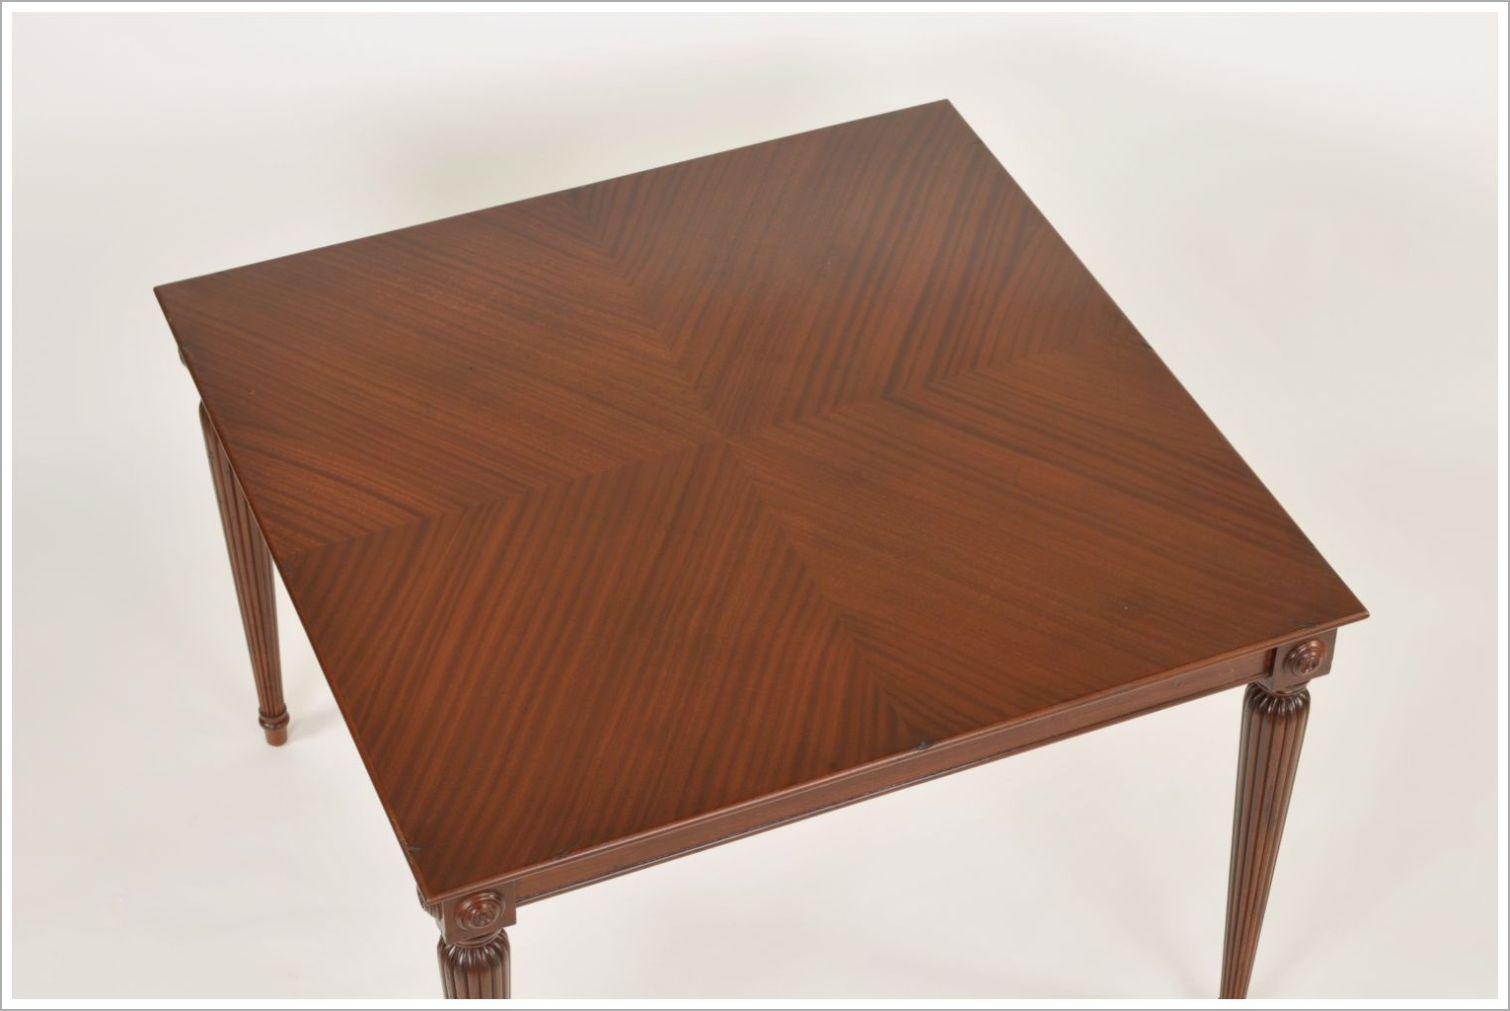 Custom Mahogany Restaurant Dining Table with Reverse Diamond Top